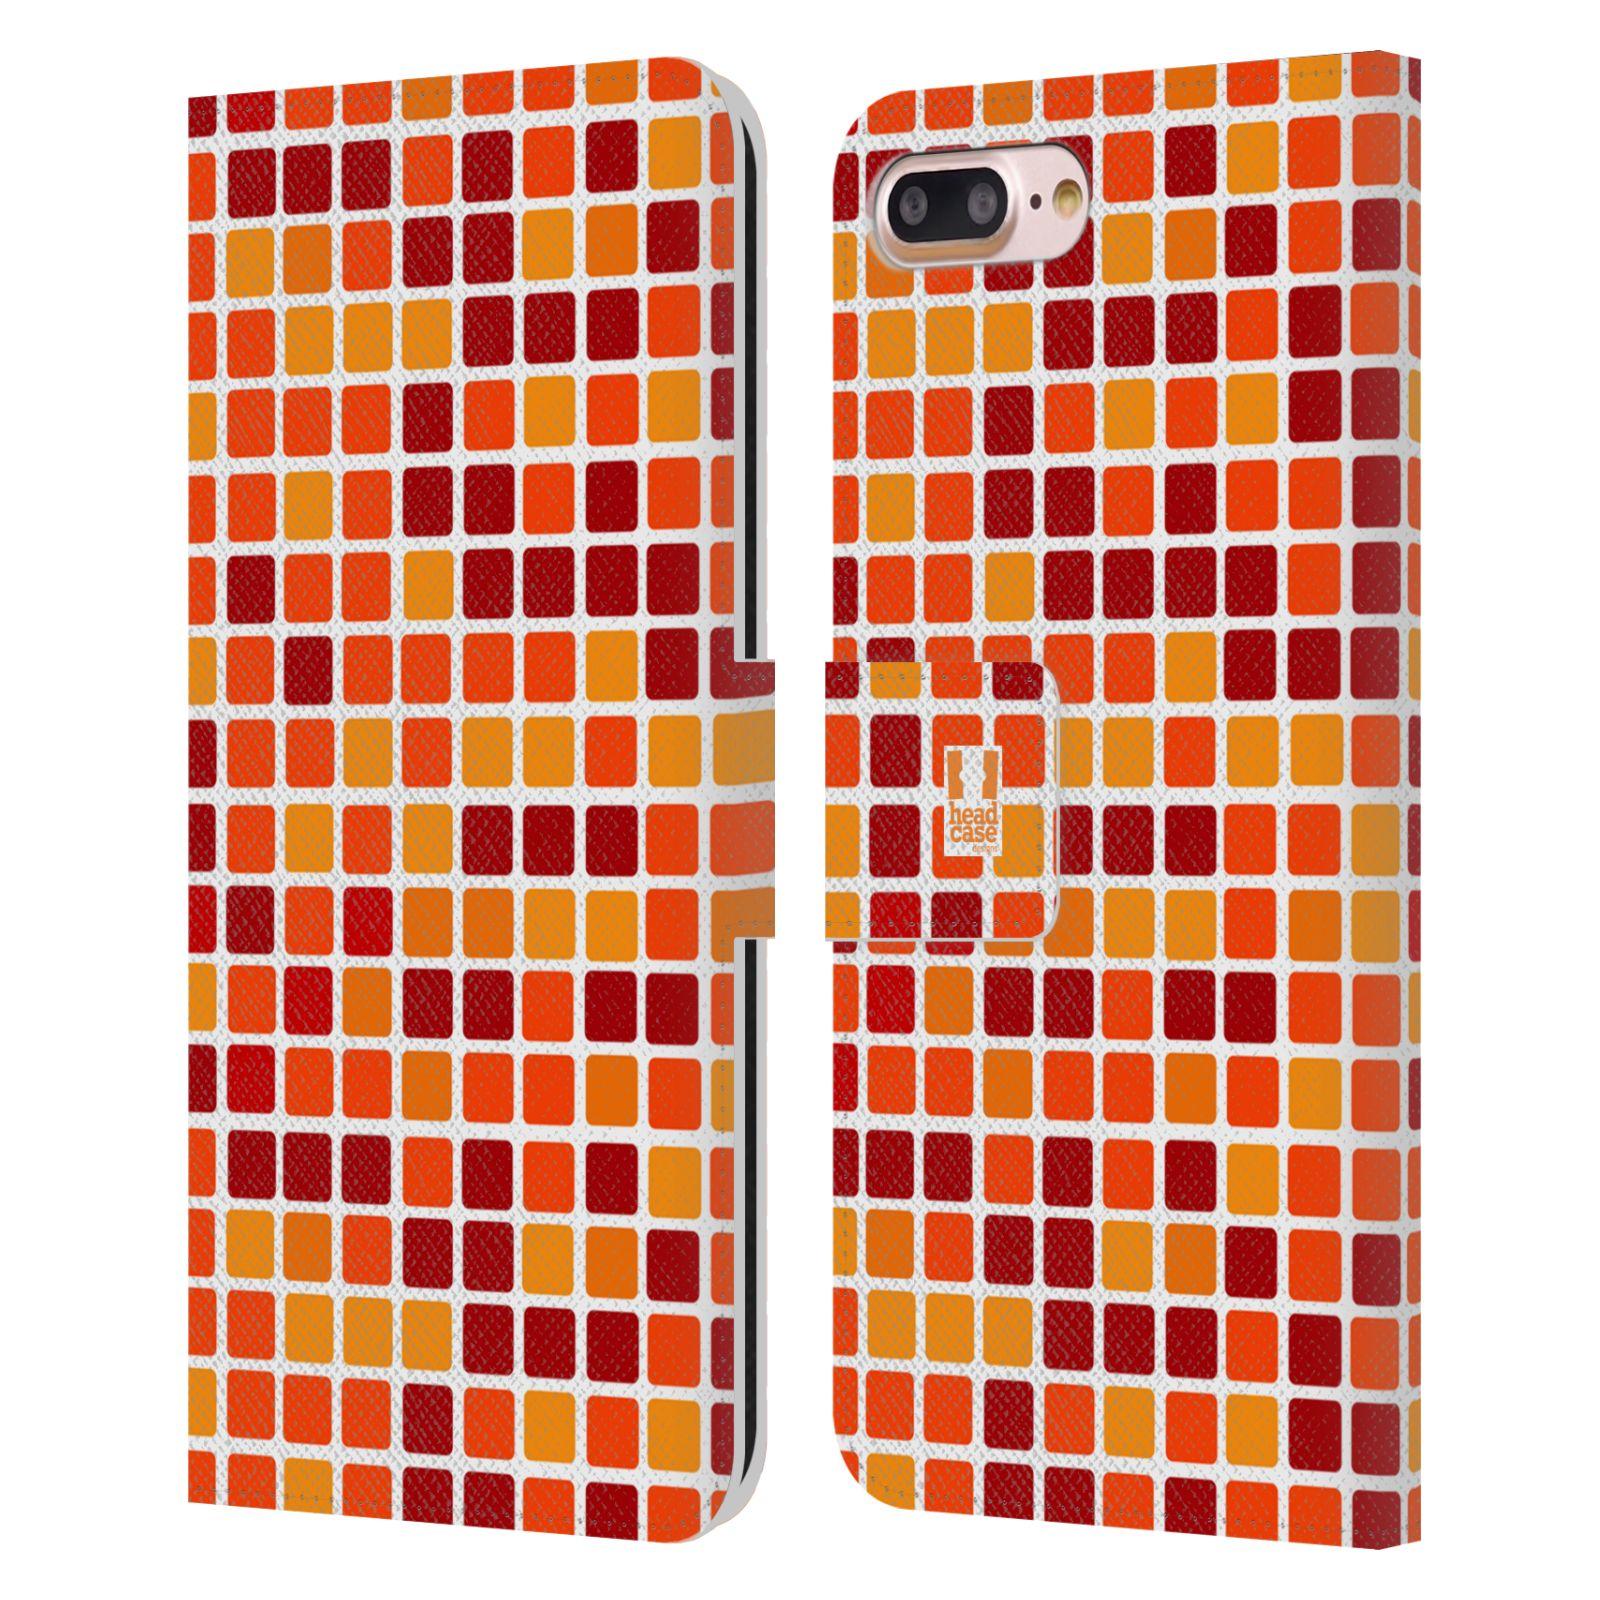 HEAD CASE Flipové pouzdro pro mobil Apple Iphone 7 PLUS / 8 PLUS DISKO kostičky oranžová